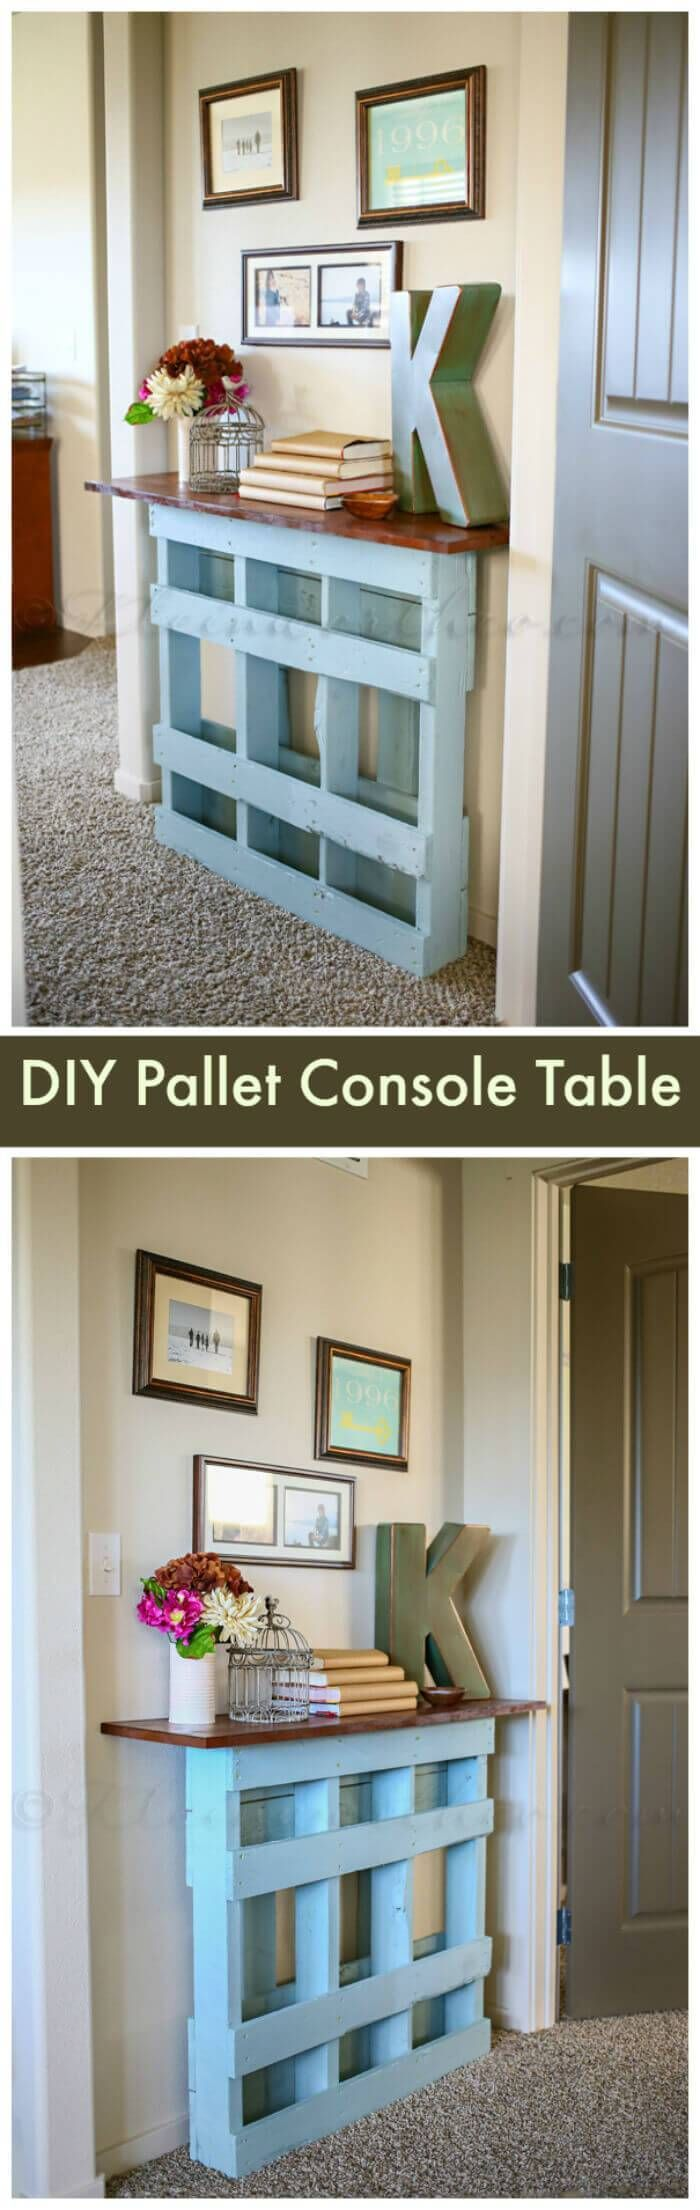 20+ Creative DIY Pallet Furniture Ideas